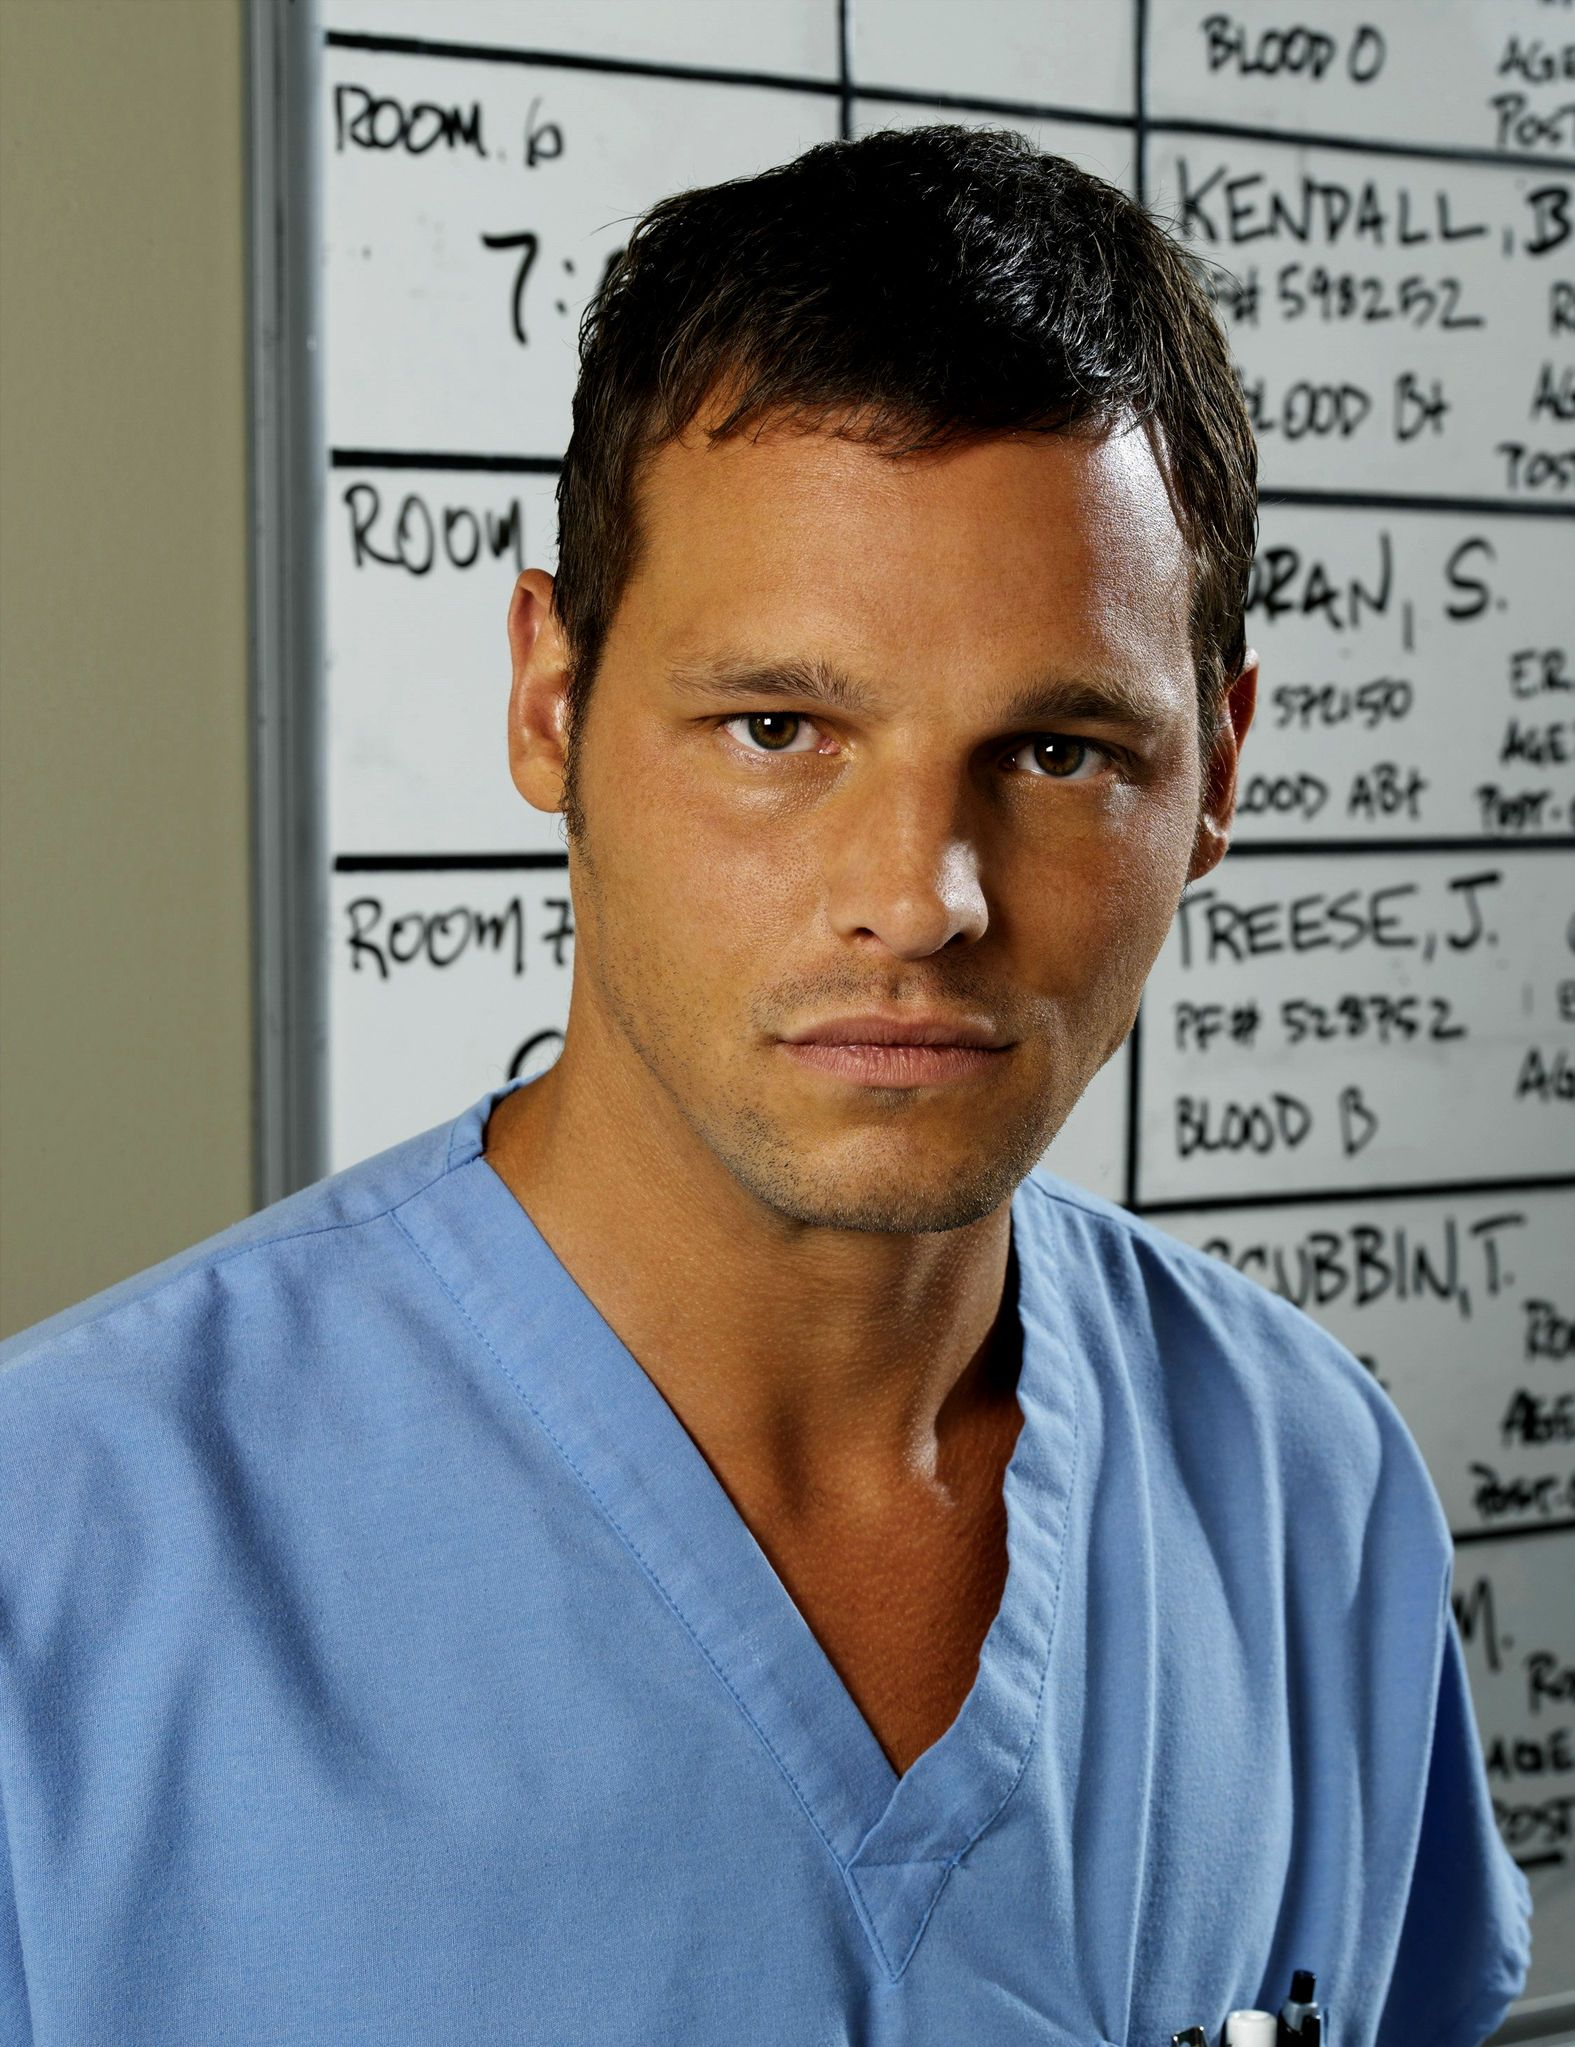 Amazing Greys Anatomy Series 2 Photos - Anatomy and Physiology ...